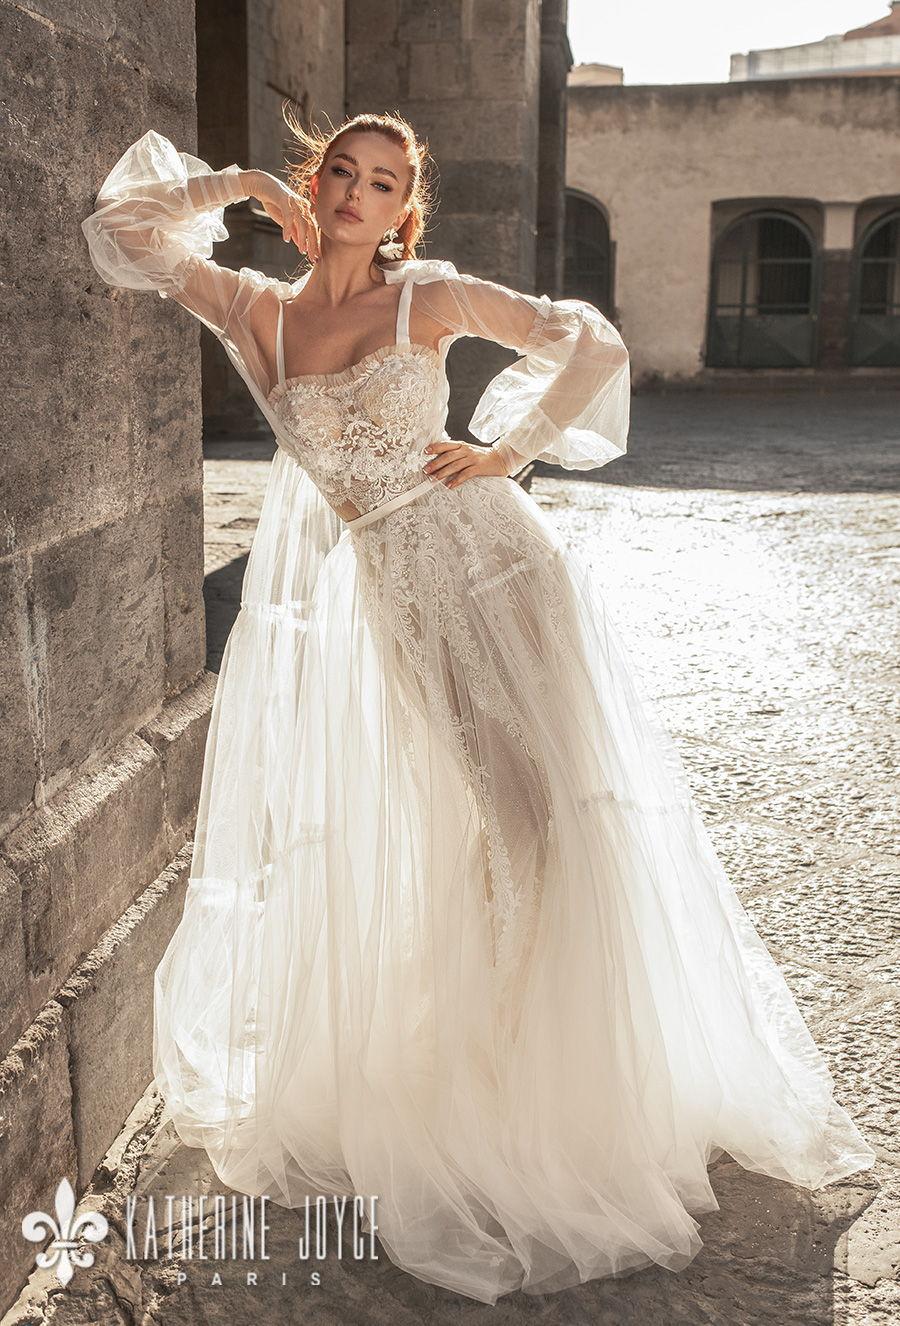 katherine joyce 2021 naples bridal long bishop sleeves ribbon straps sweetheart neckline heavy embellished bodice tulle skirt romantic a line wedding dress mid back medium train (camila) mv